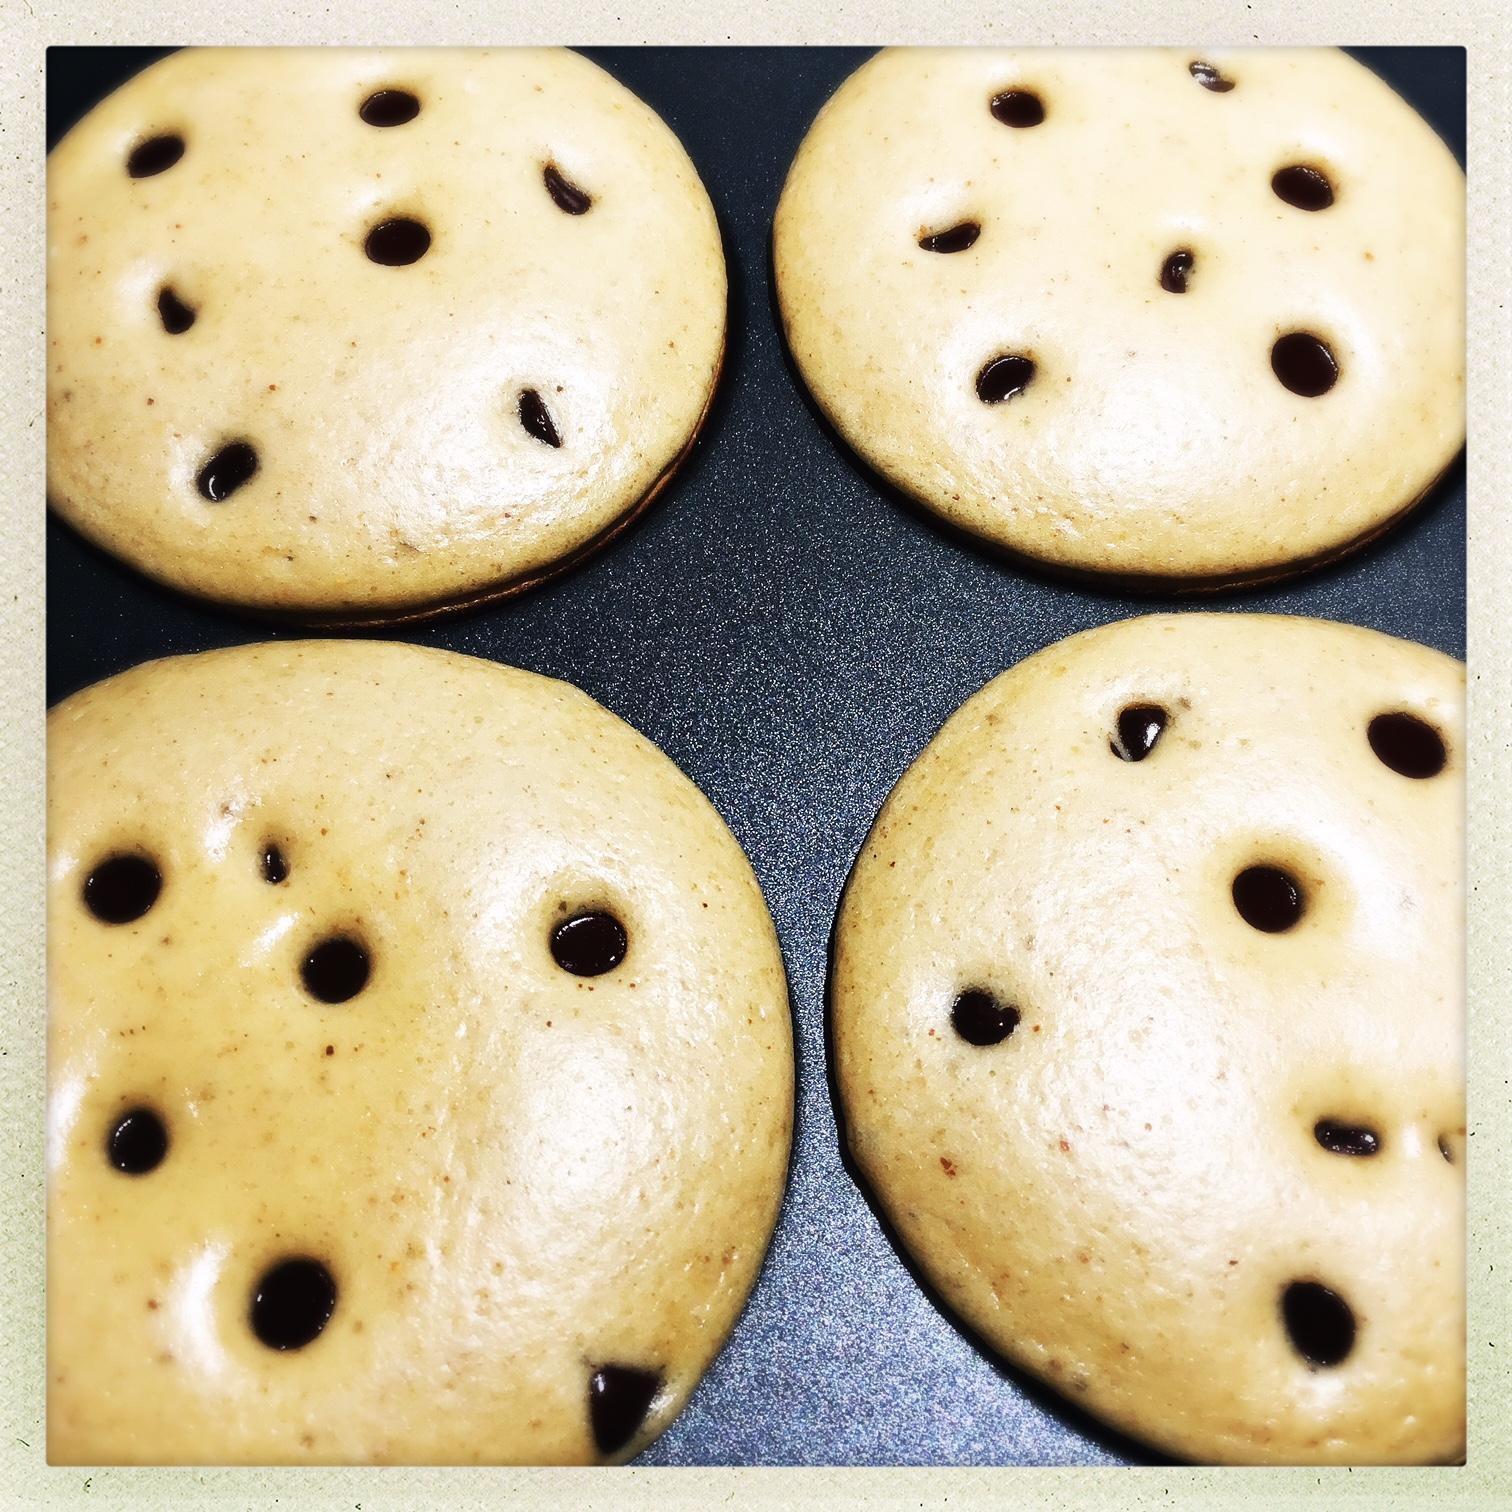 pancakes ready to flip.jpg